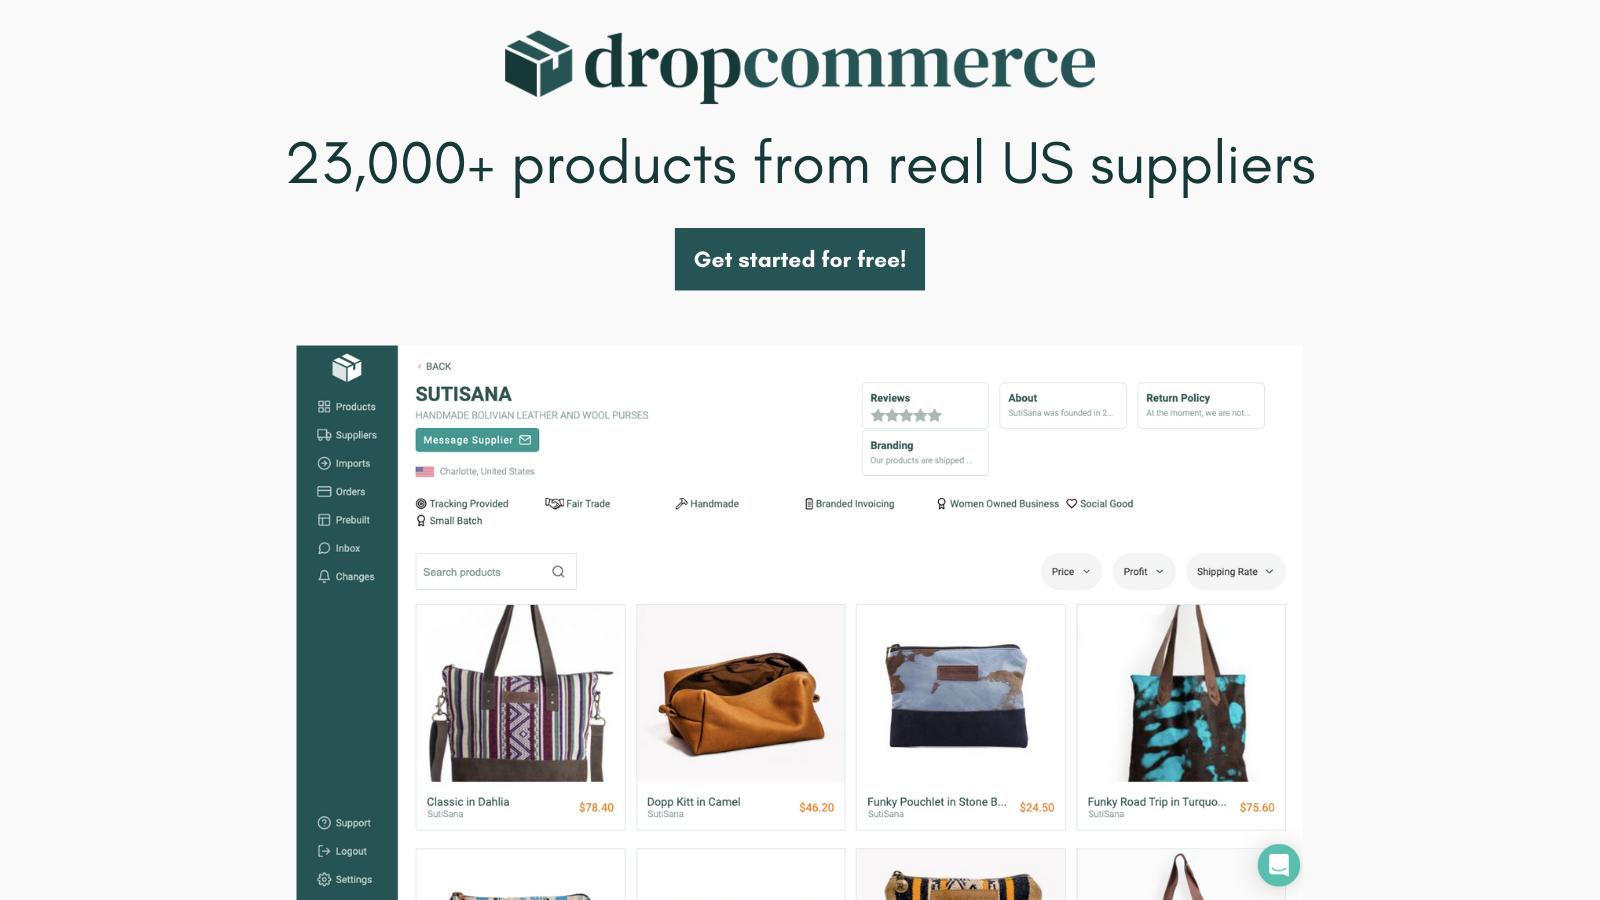 dropcommerce fornitori dropshipping